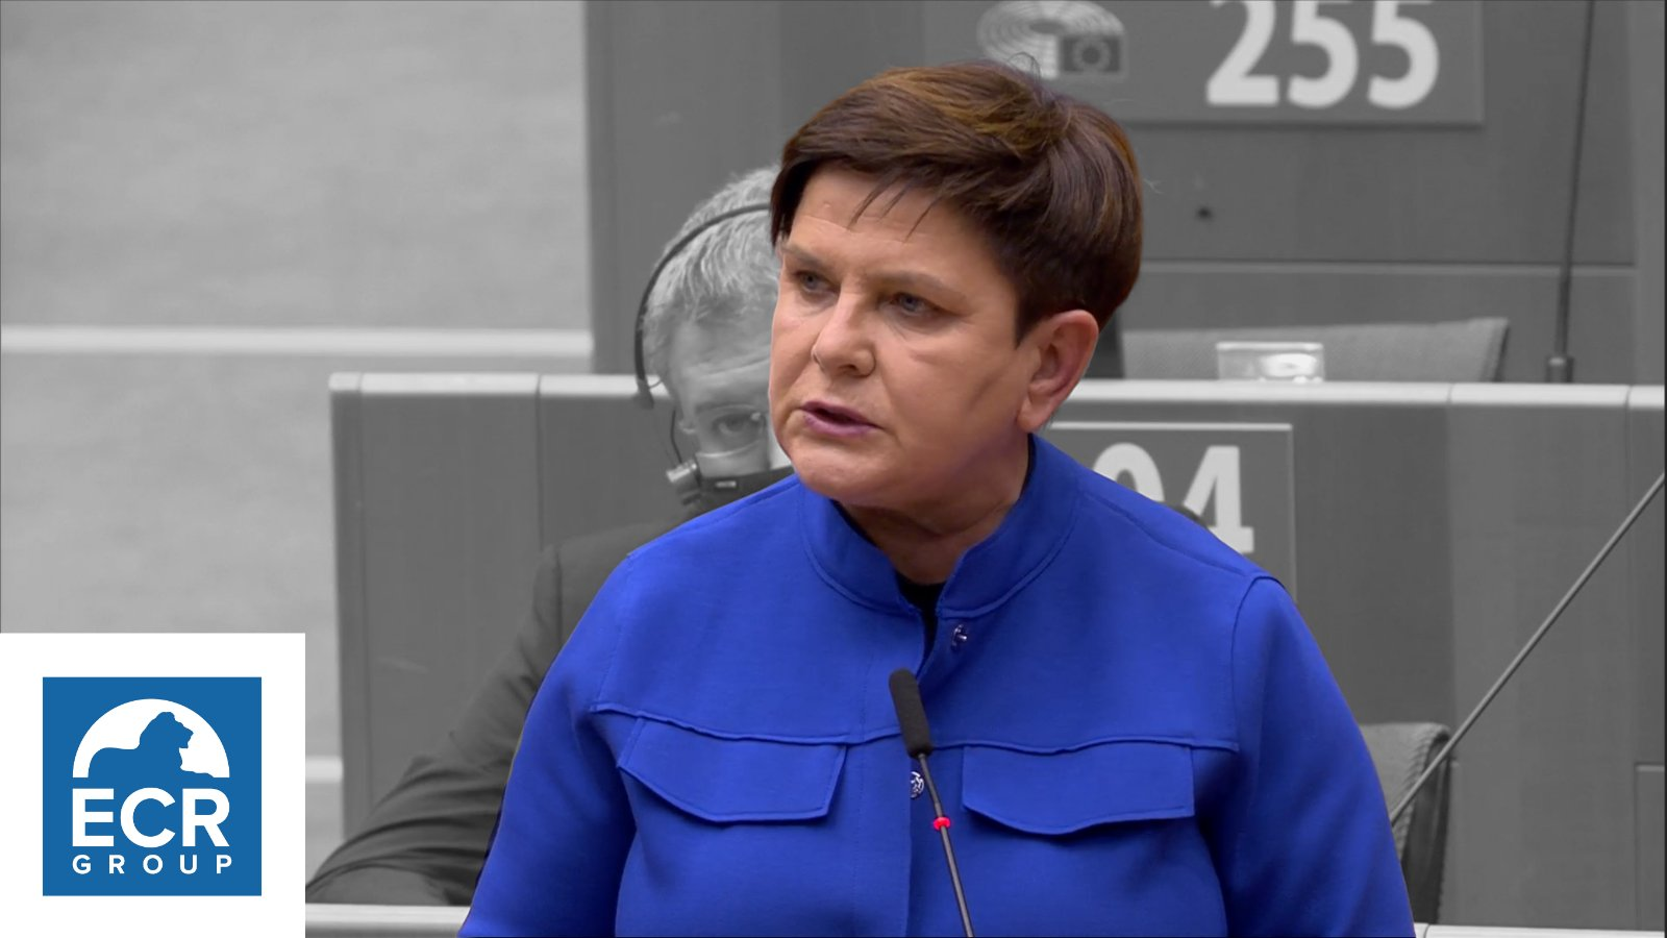 ECR MEP Beata Szydło on the preparation of the European Council meeting